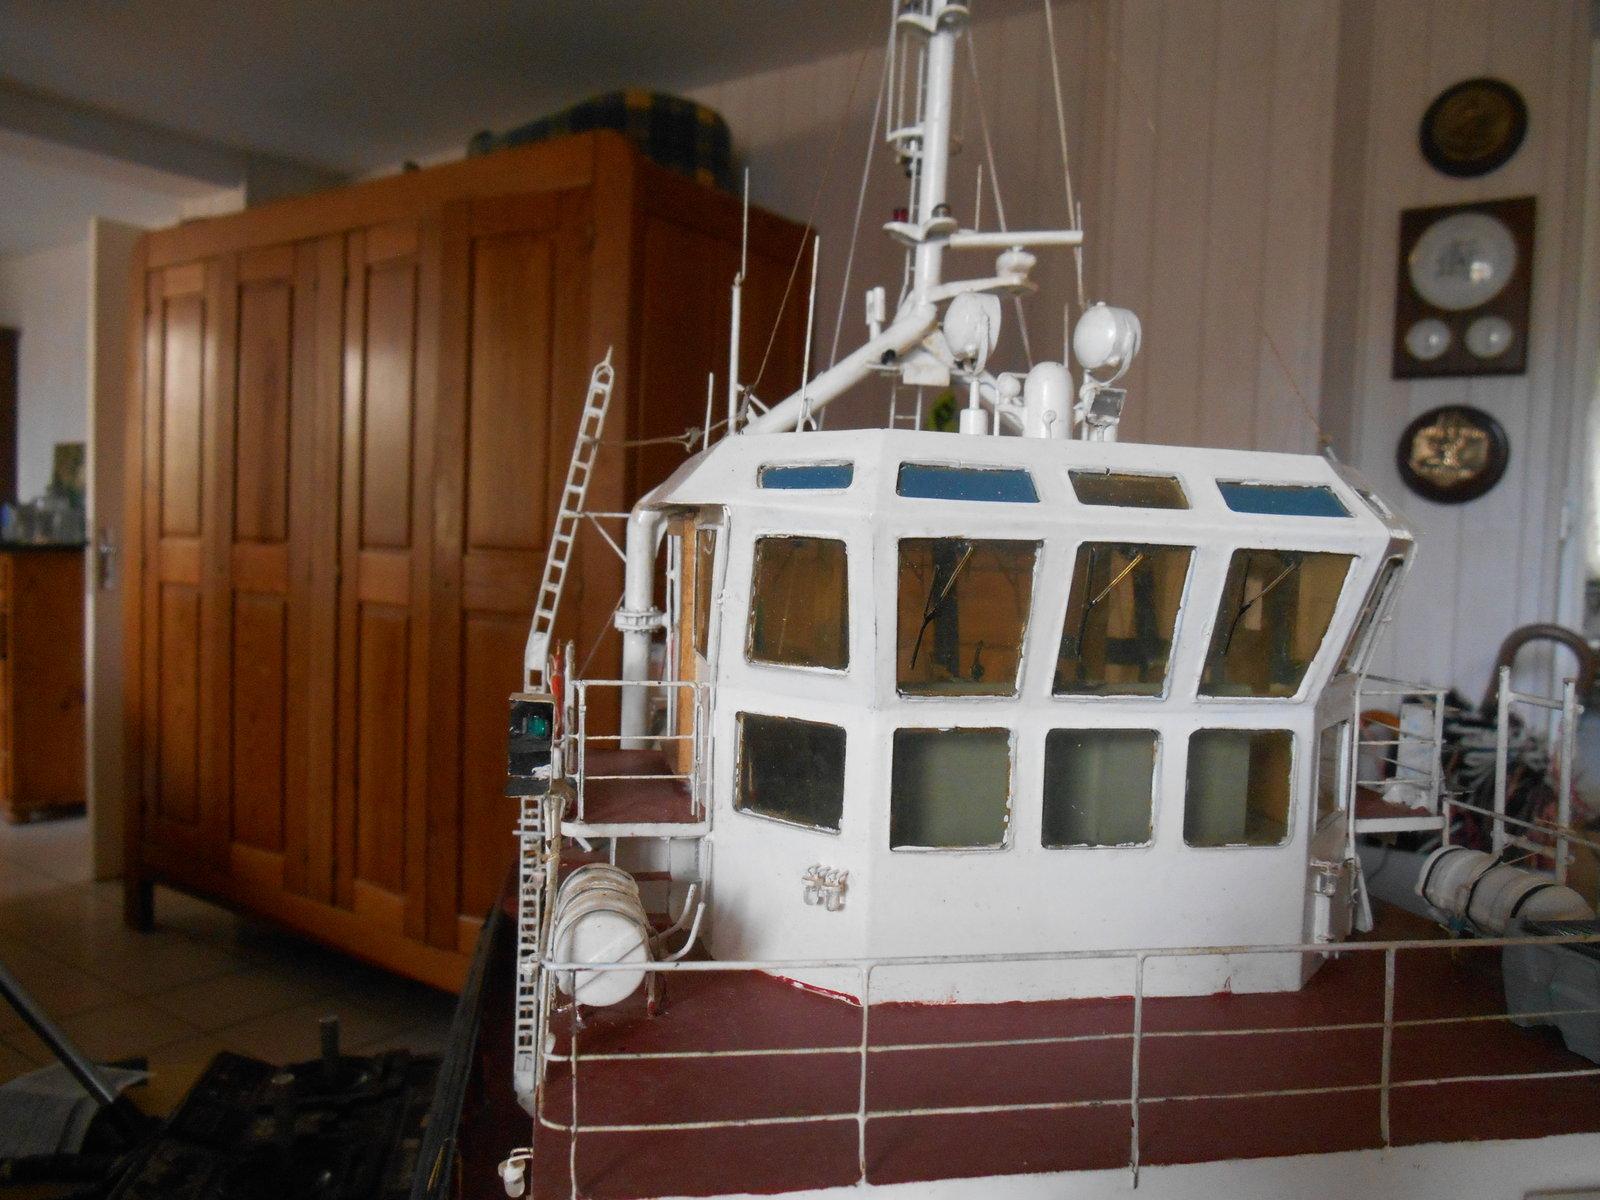 Tracteur azimutal VB Pouliguen de Namornik 200607084436236228